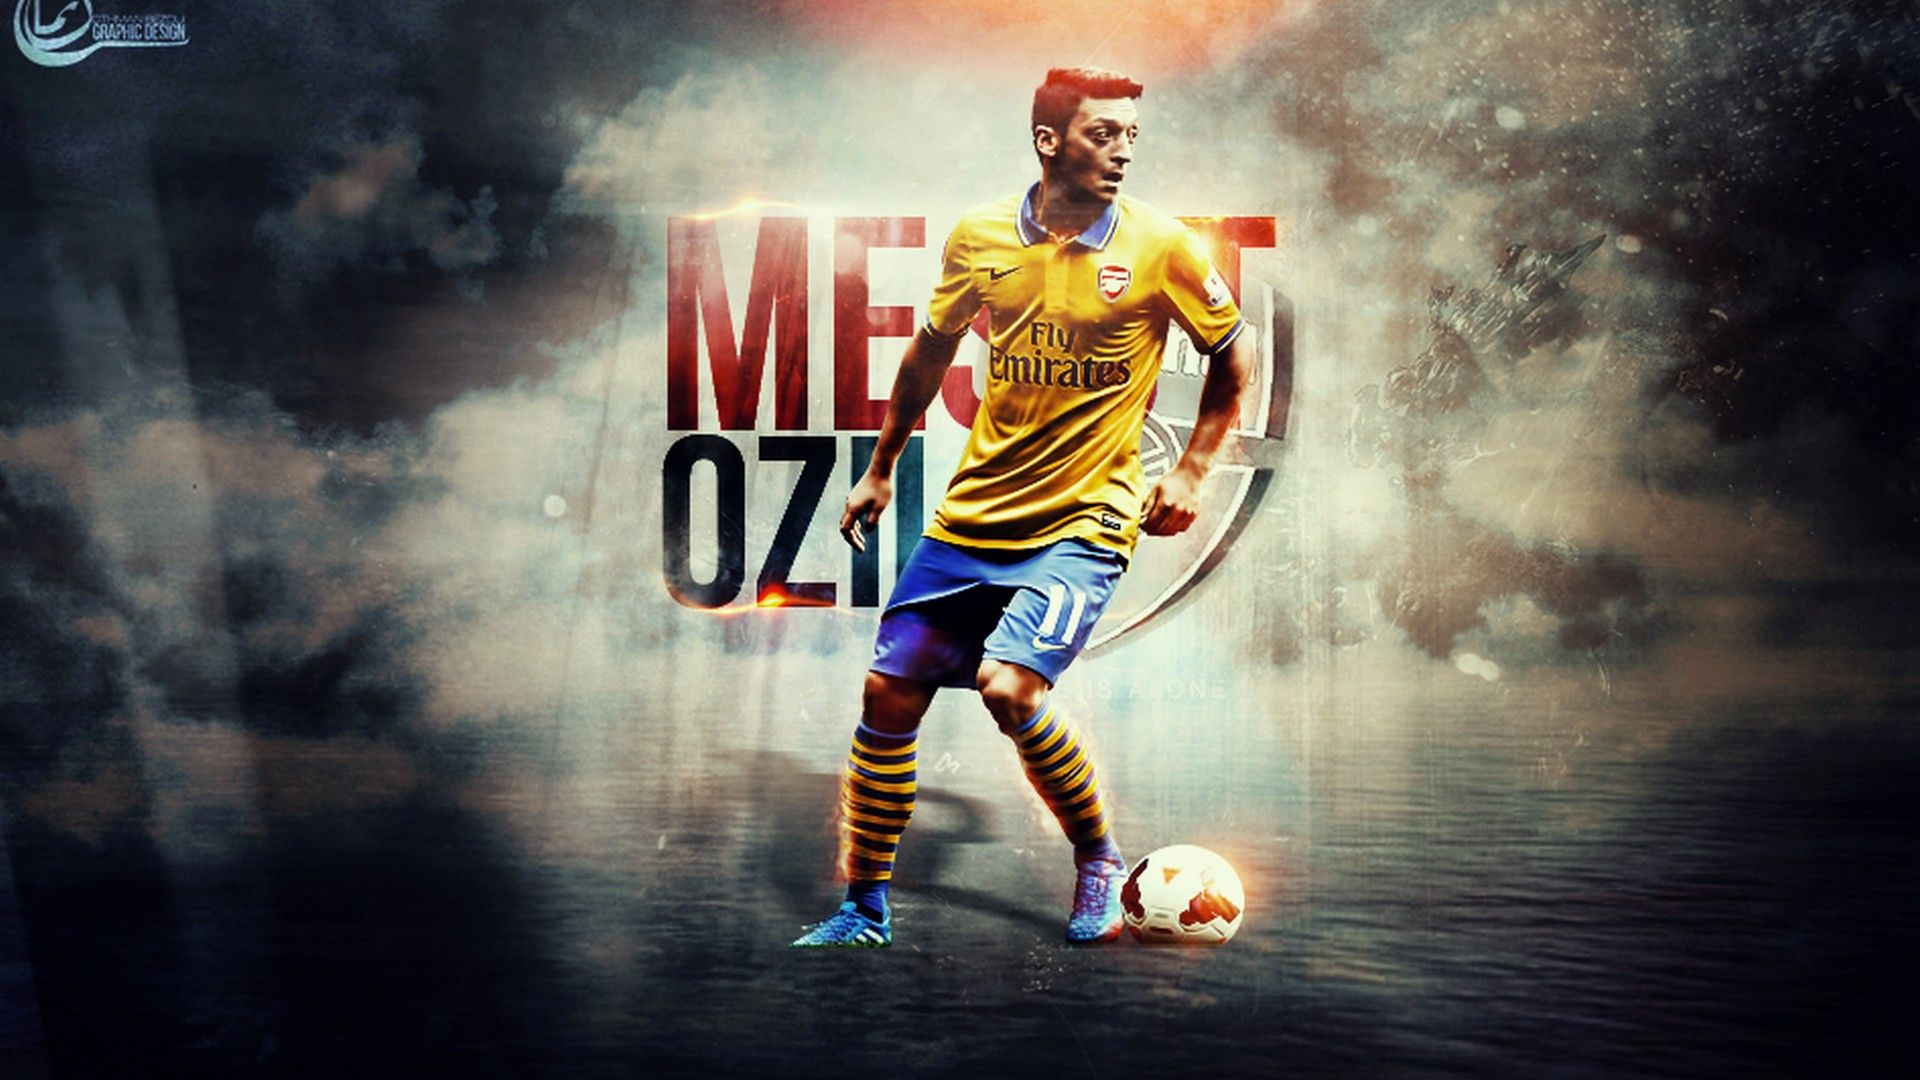 Live Wallpaper Hd Arsenal Wallpapers Mesut Ozil Arsenal Arsenal